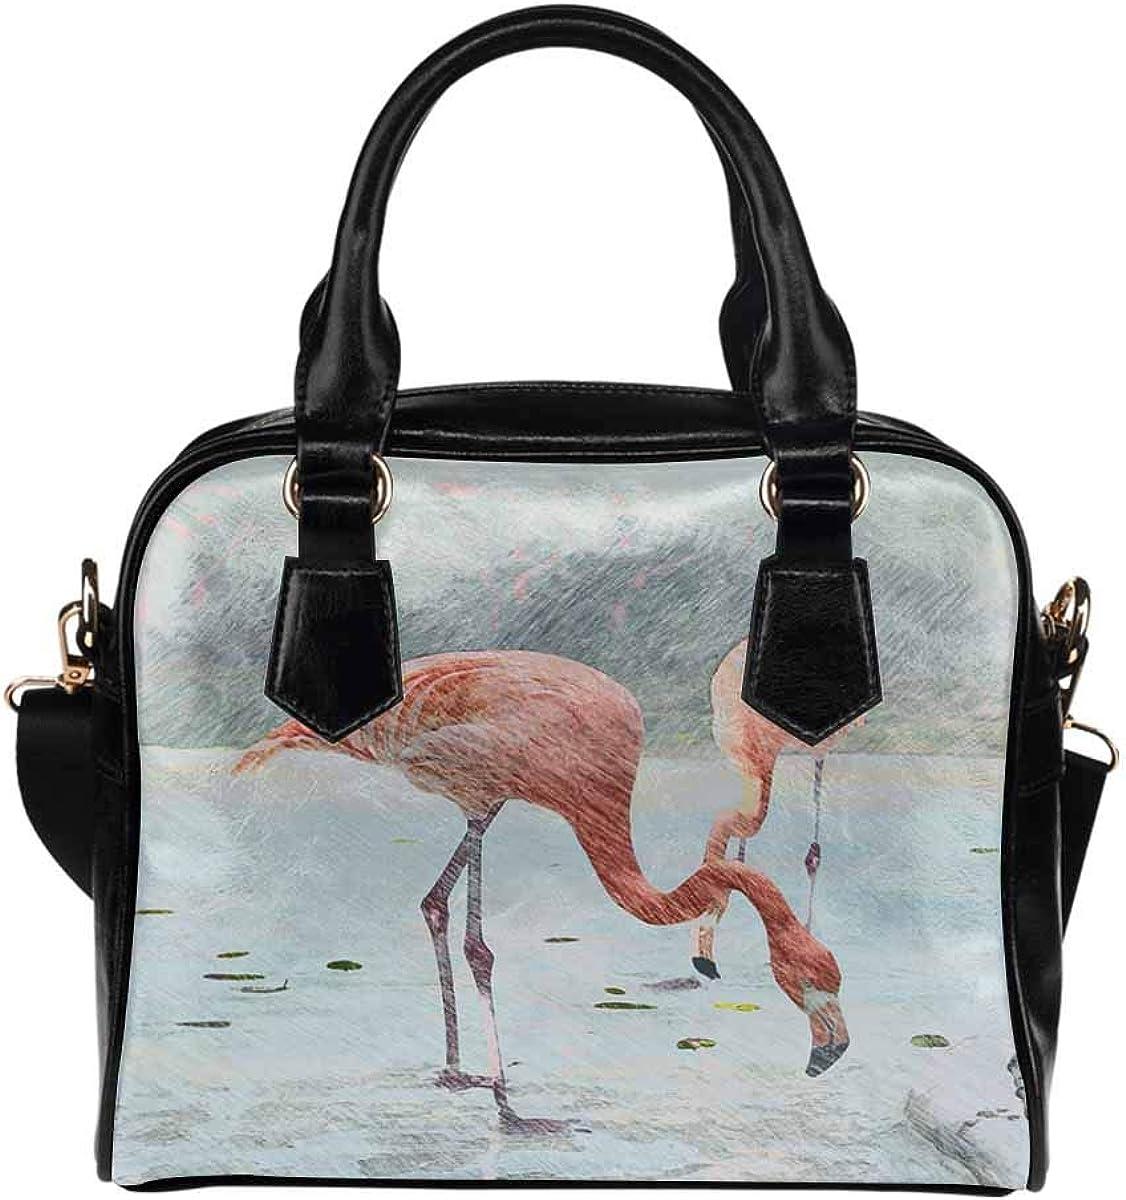 Flamingos Close Up Womens Top Handle PU Leather Shoulder Satchel Bag InterestPrint Pencil Sketch